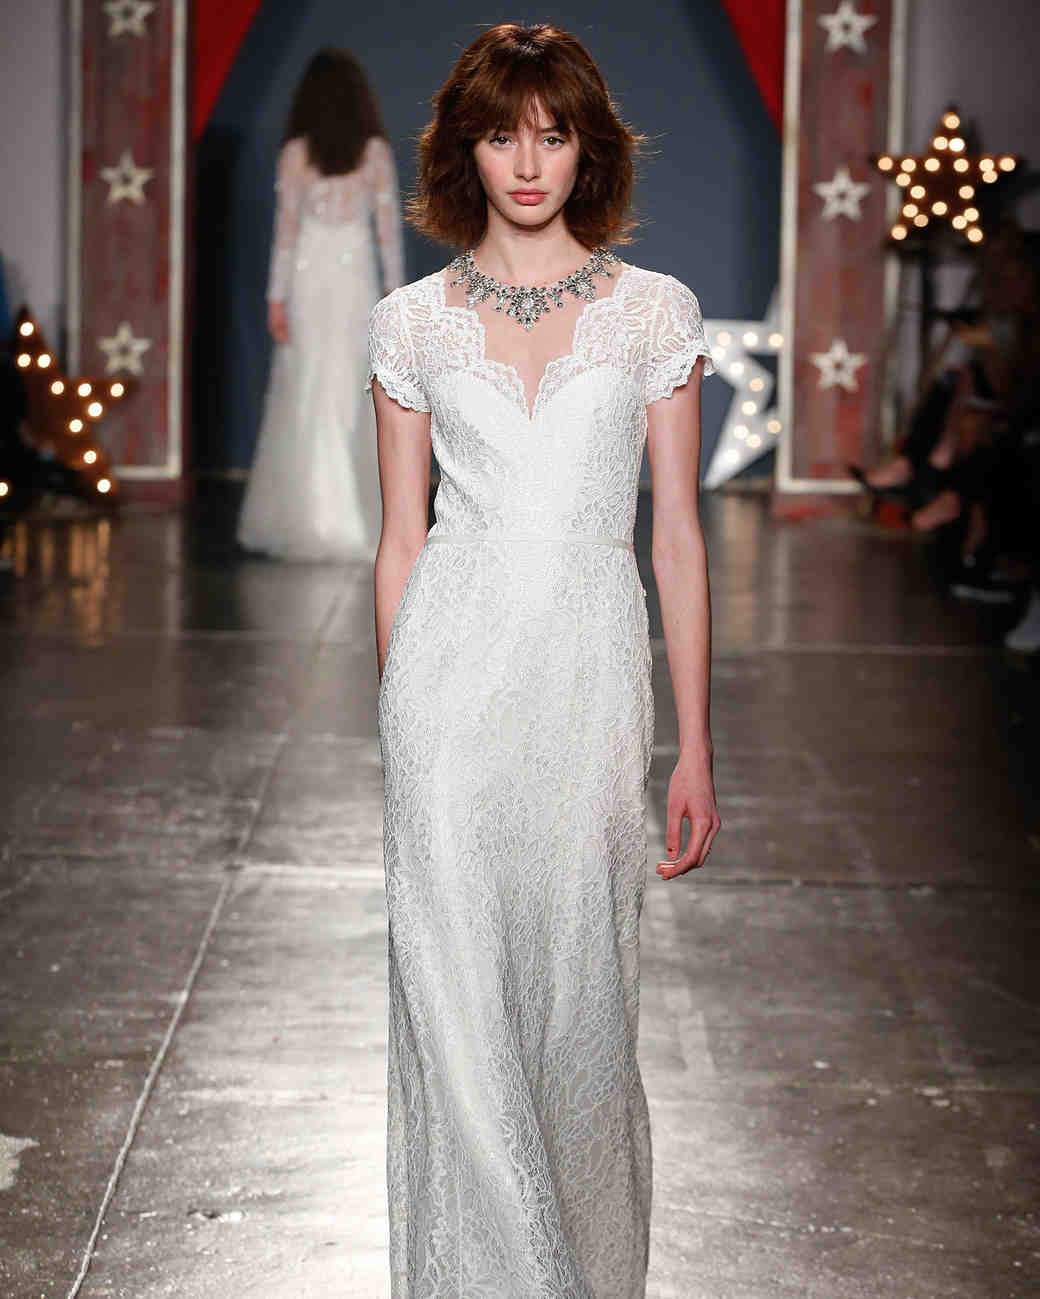 jenny packham wedding dress spring 2018 lace cap sleeves